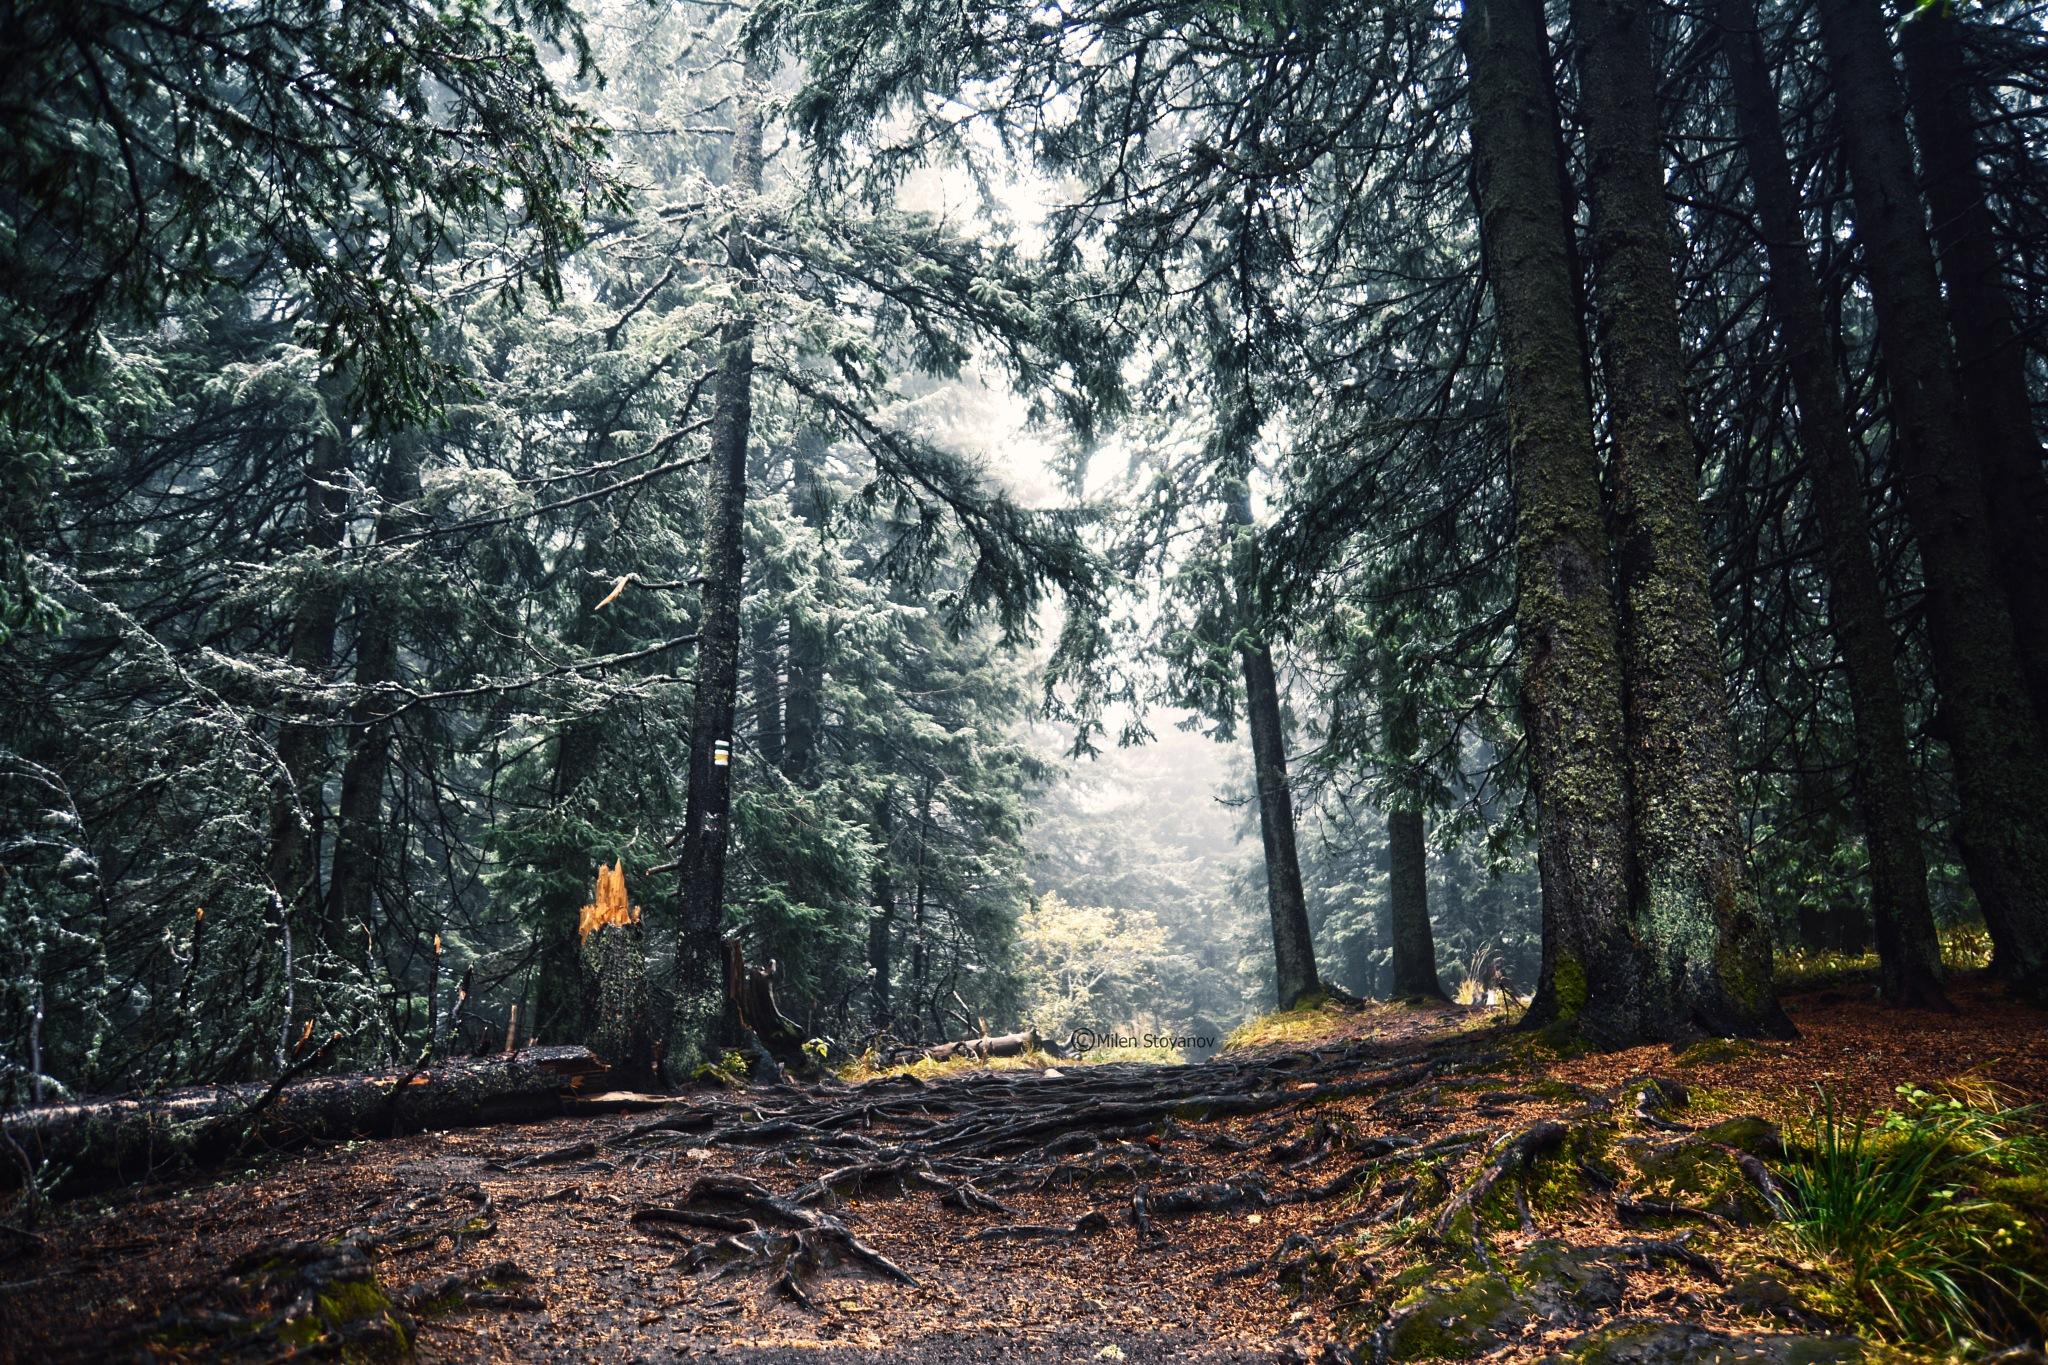 Deep in the woods by Milen Stoyanov